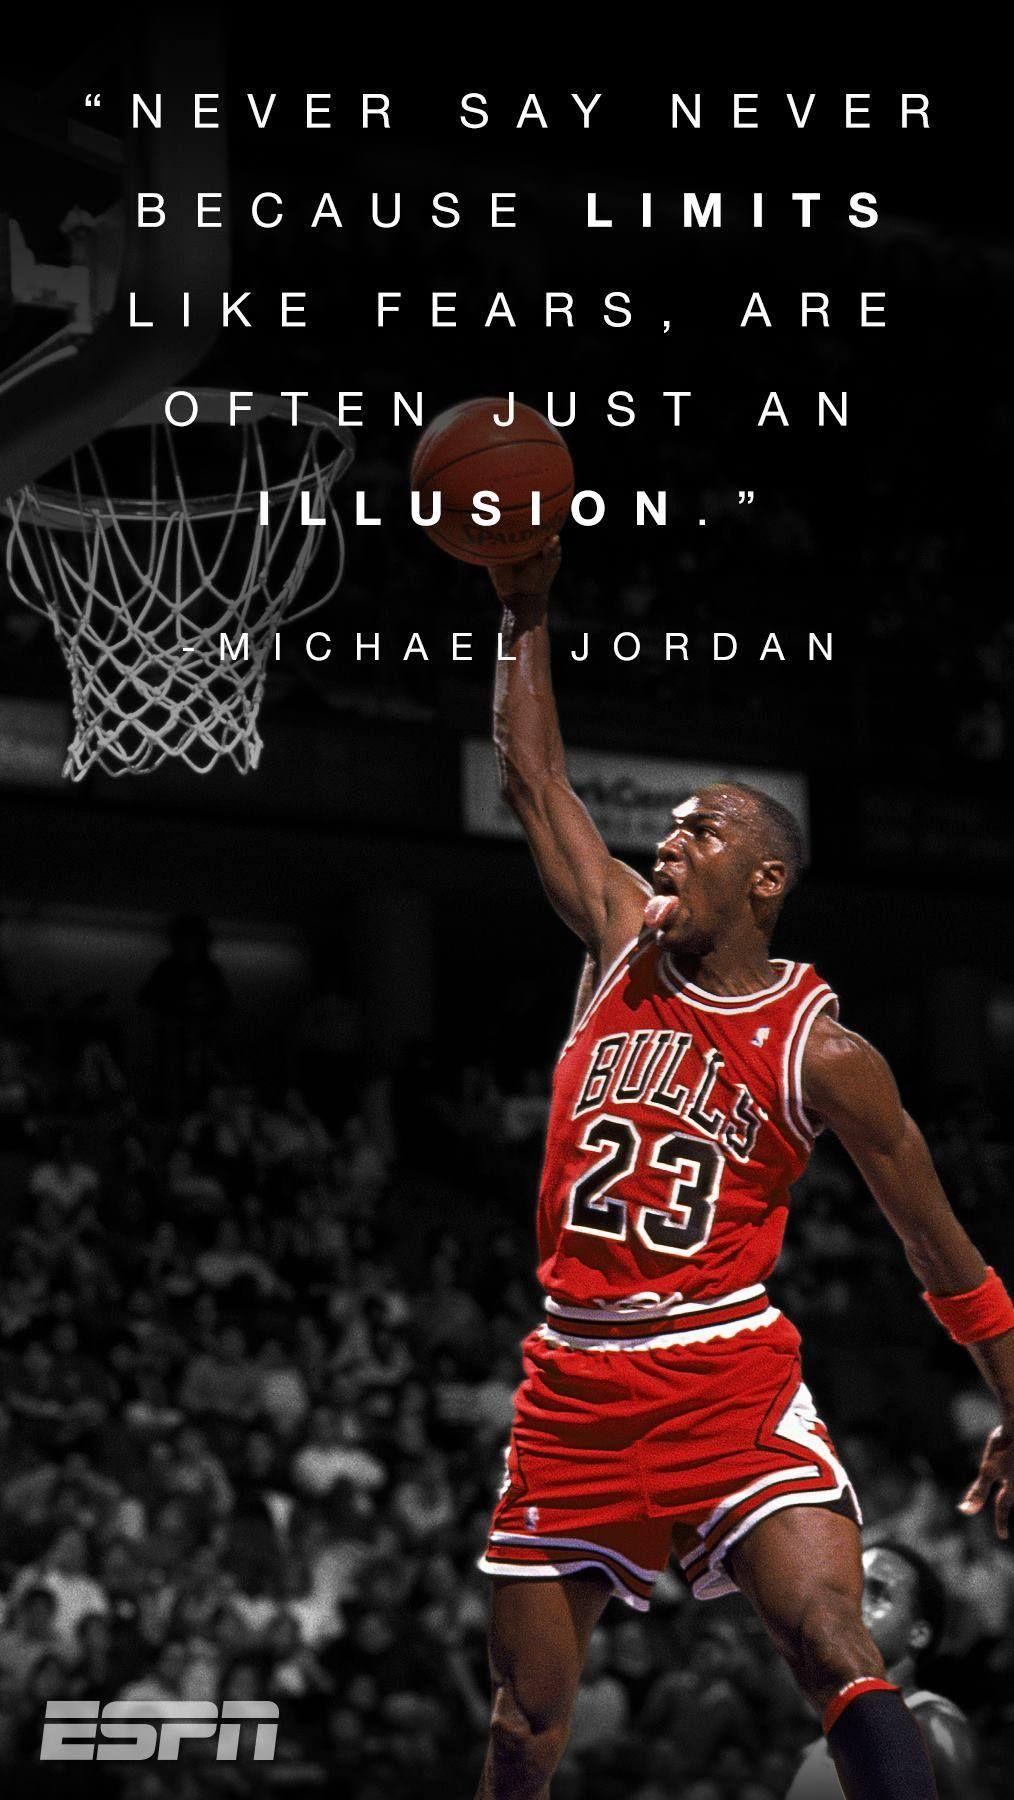 Passion Jordan Quotes Michael Jordan Quotes Inspirational Quotes Wallpapers